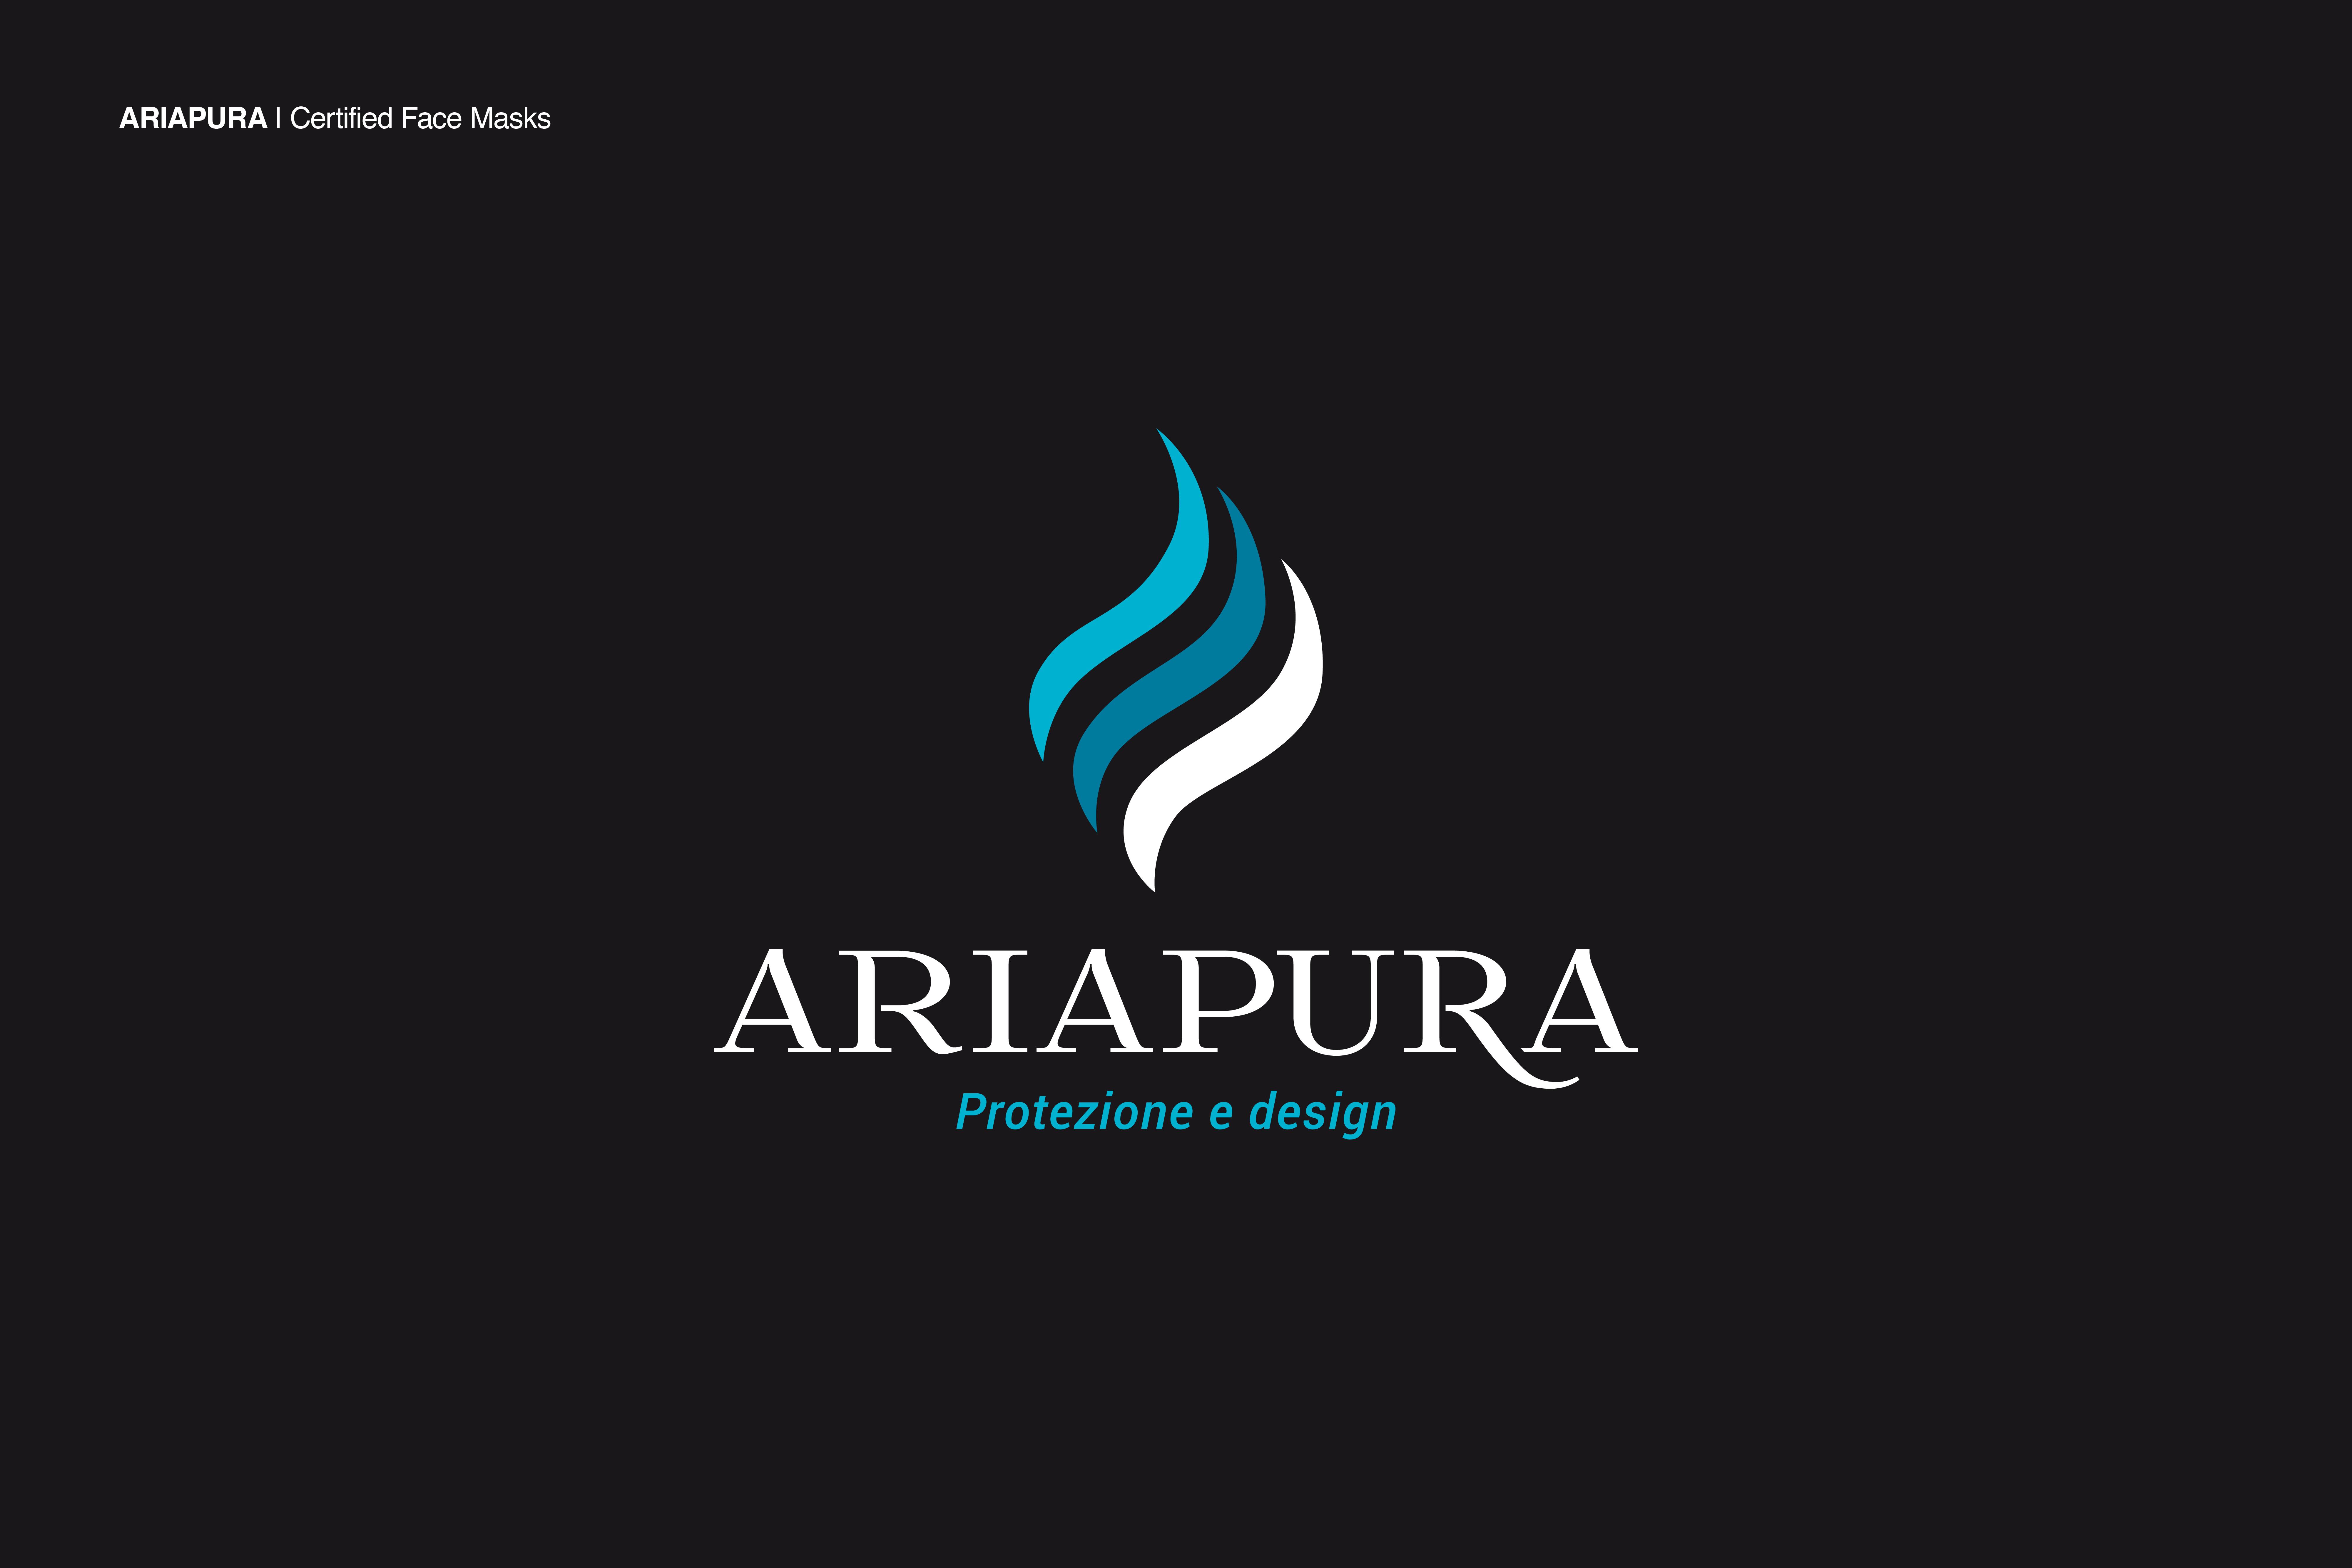 Logo Ariapura by Zerouno Design